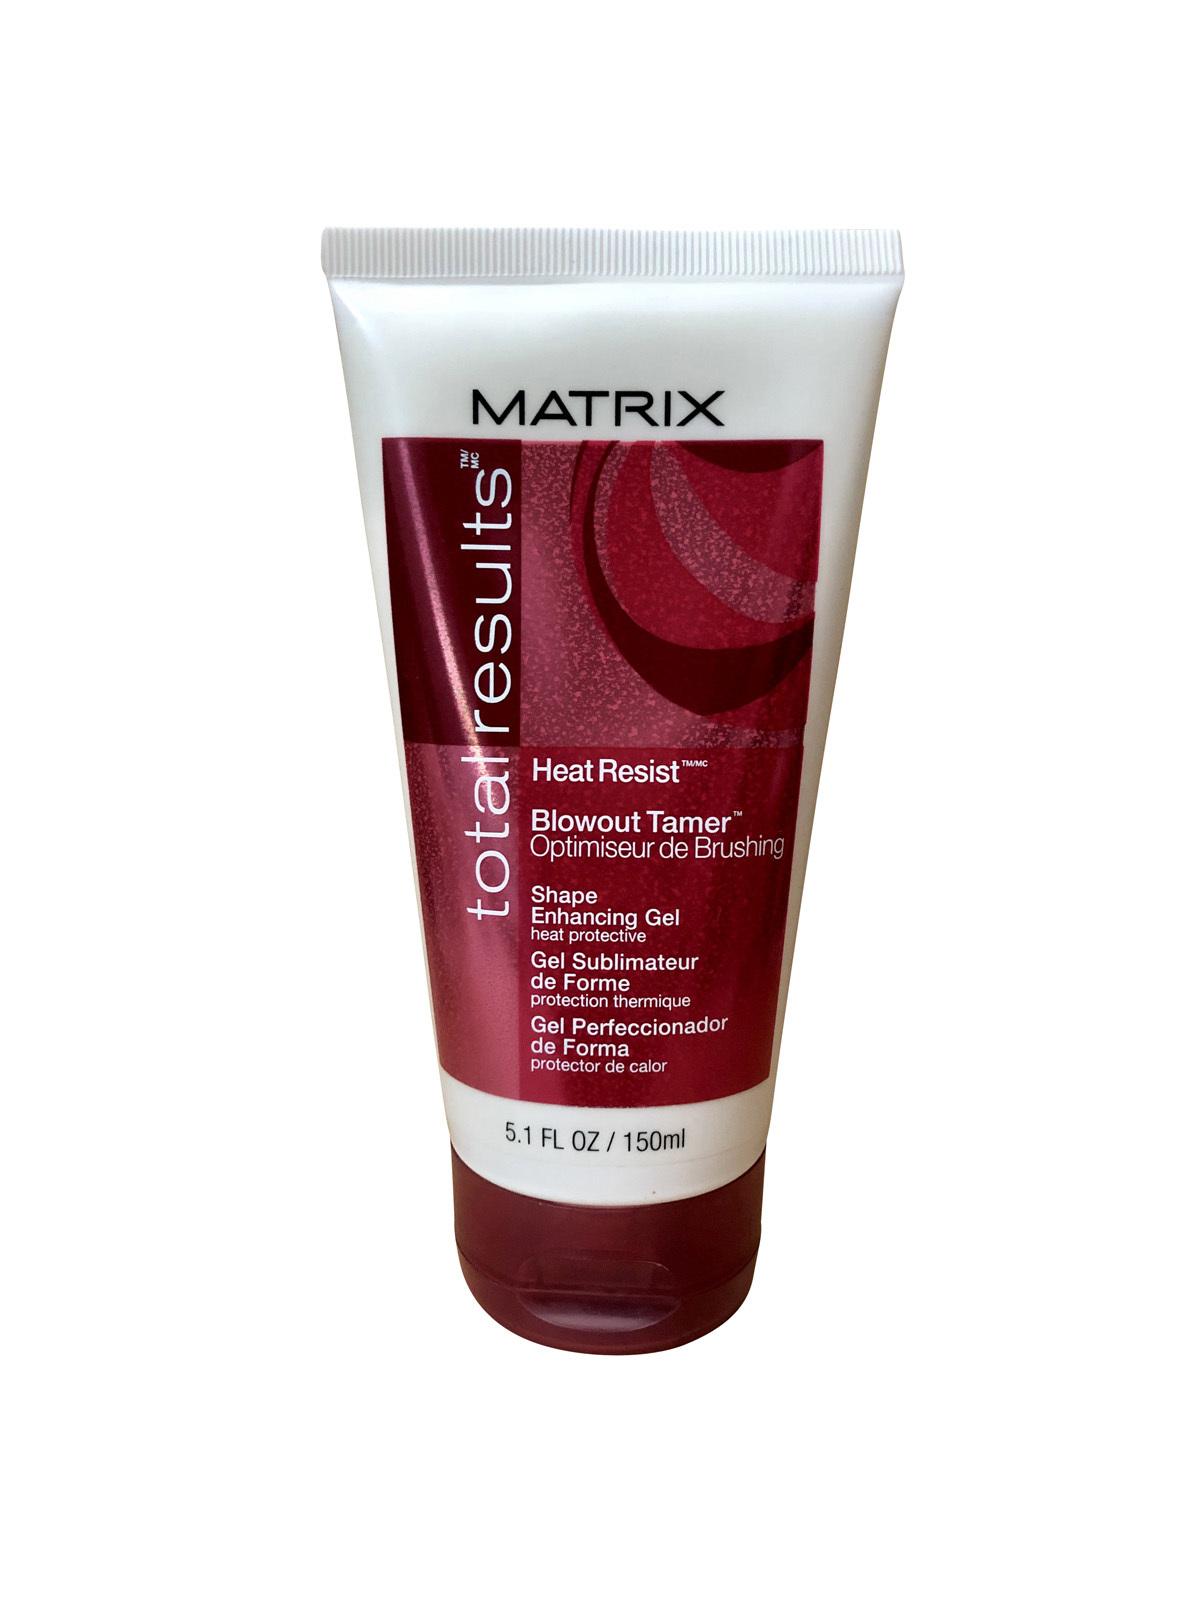 Matrix Total Results Heat Resist Blowout Tamer Shape Enhancing Gel 5.1 OZ - $12.99